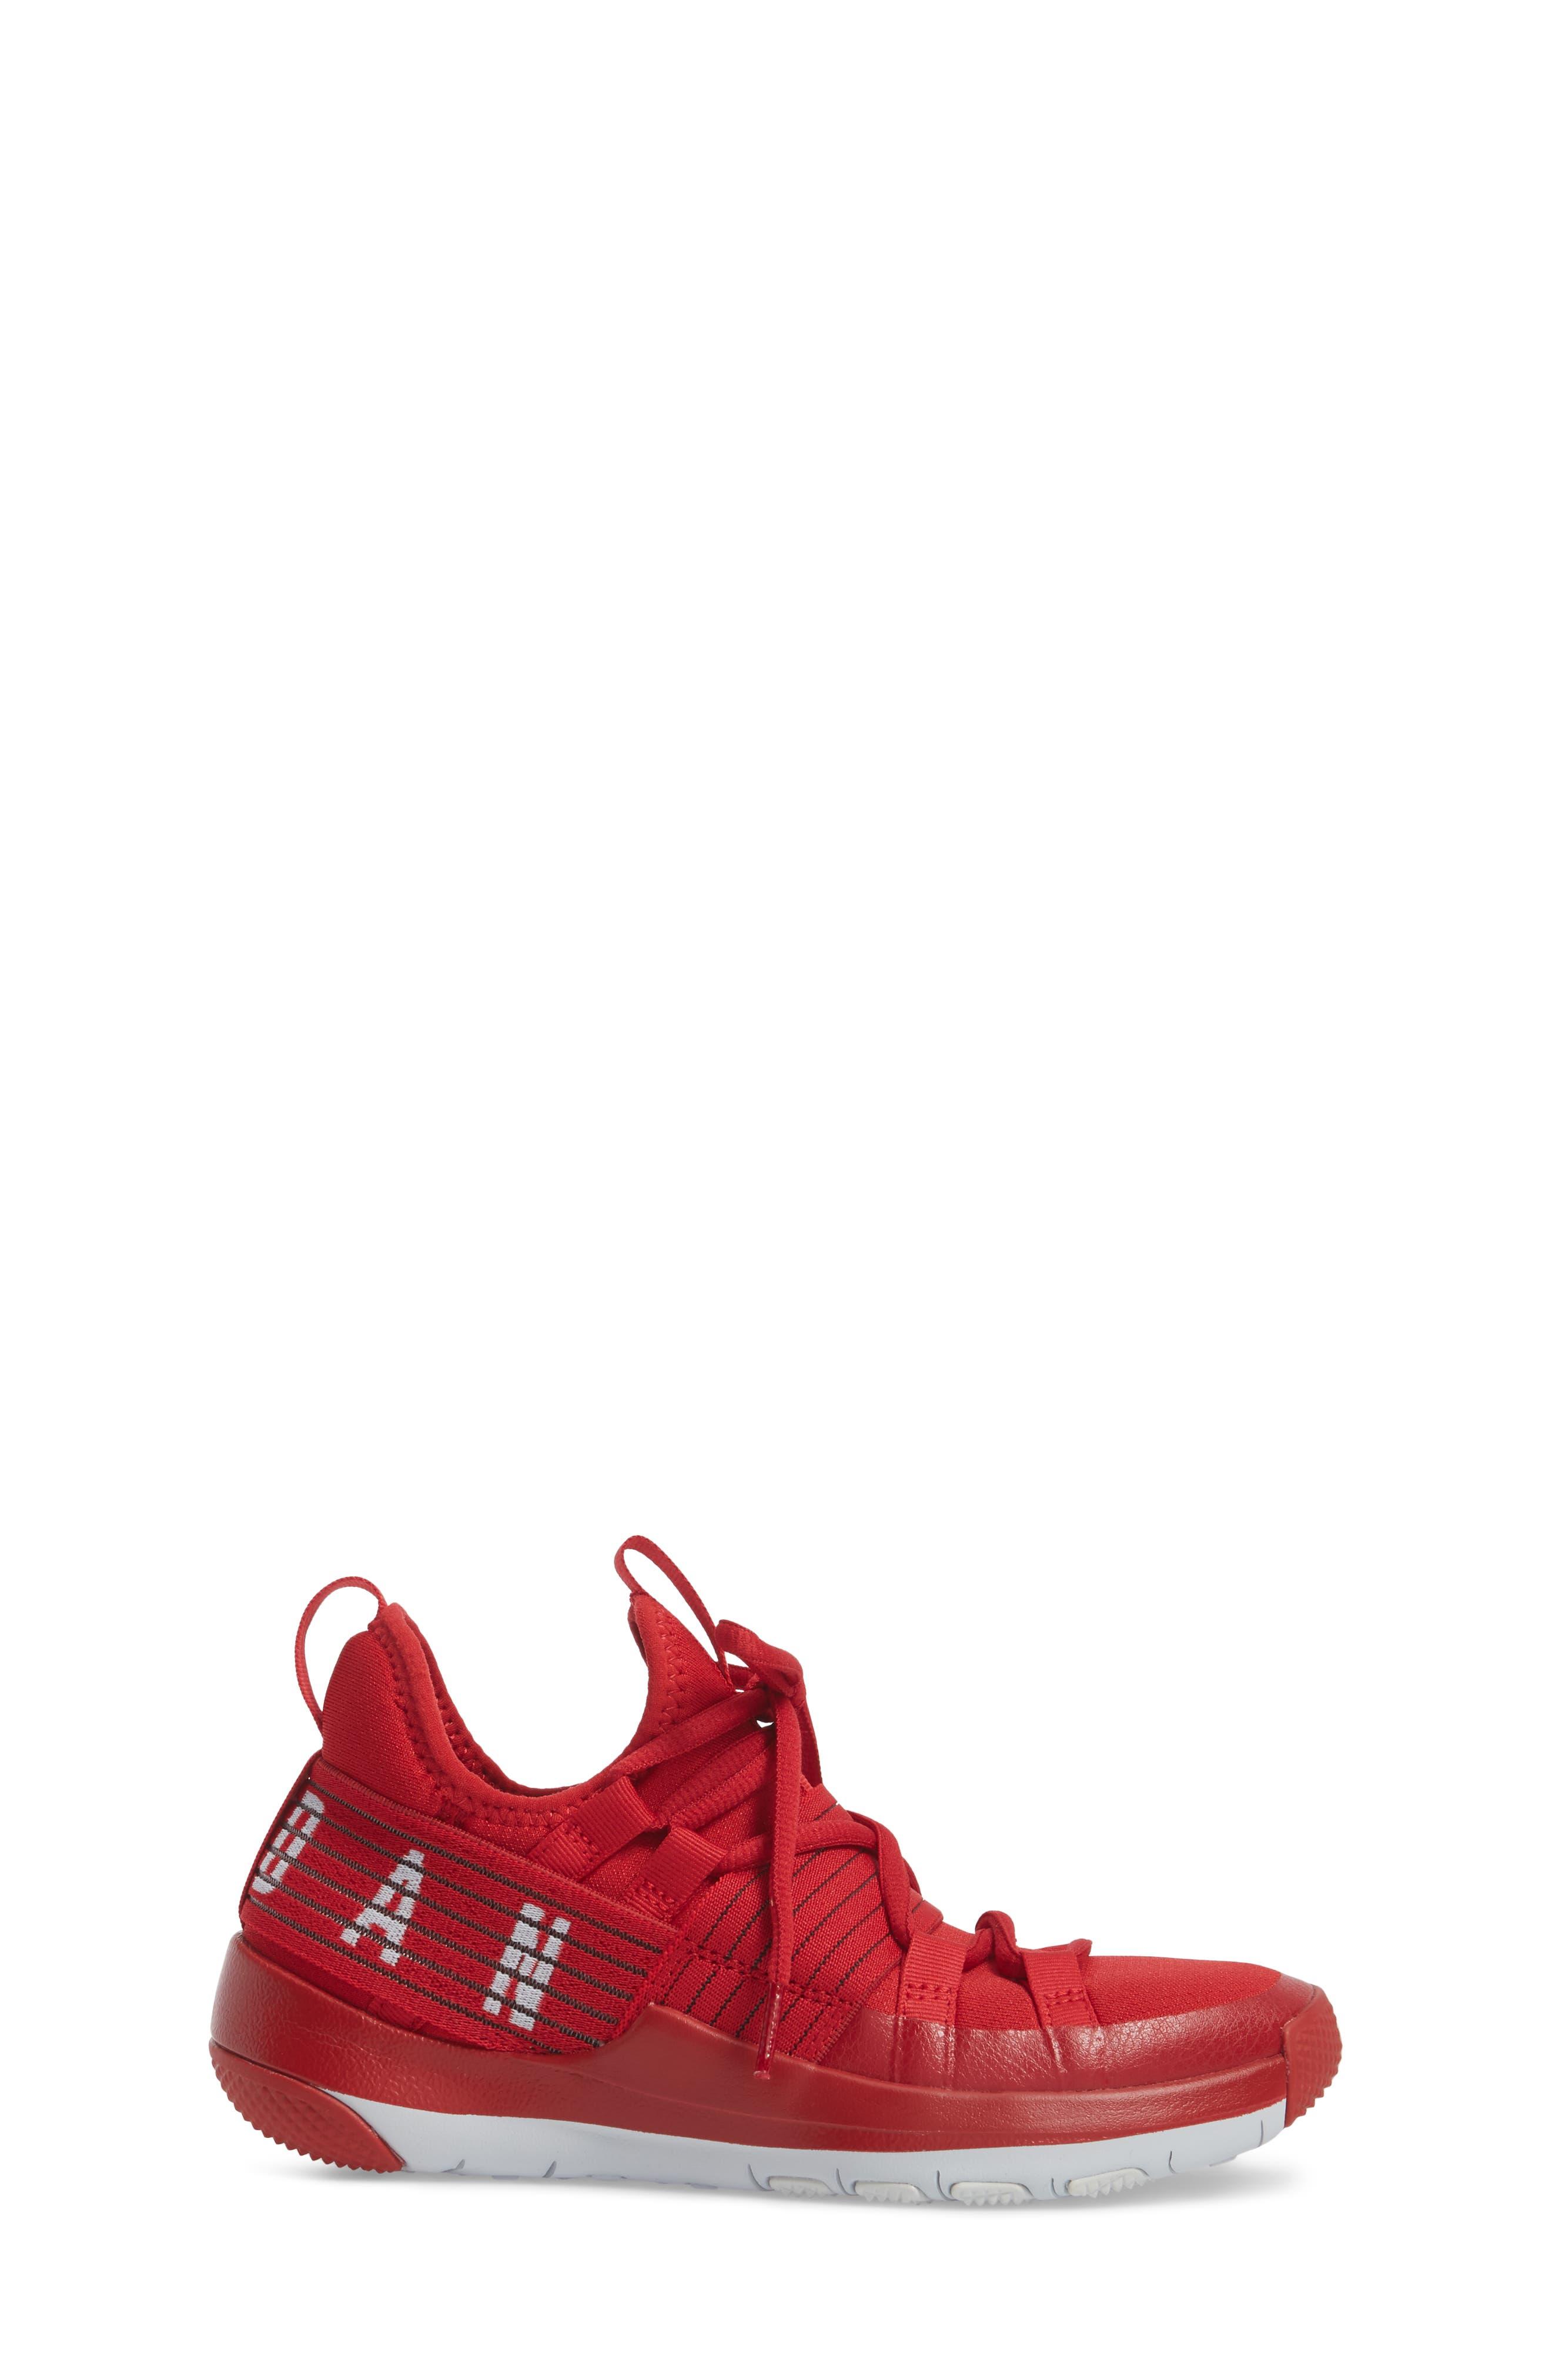 Trainer Pro Training Shoe,                             Alternate thumbnail 3, color,